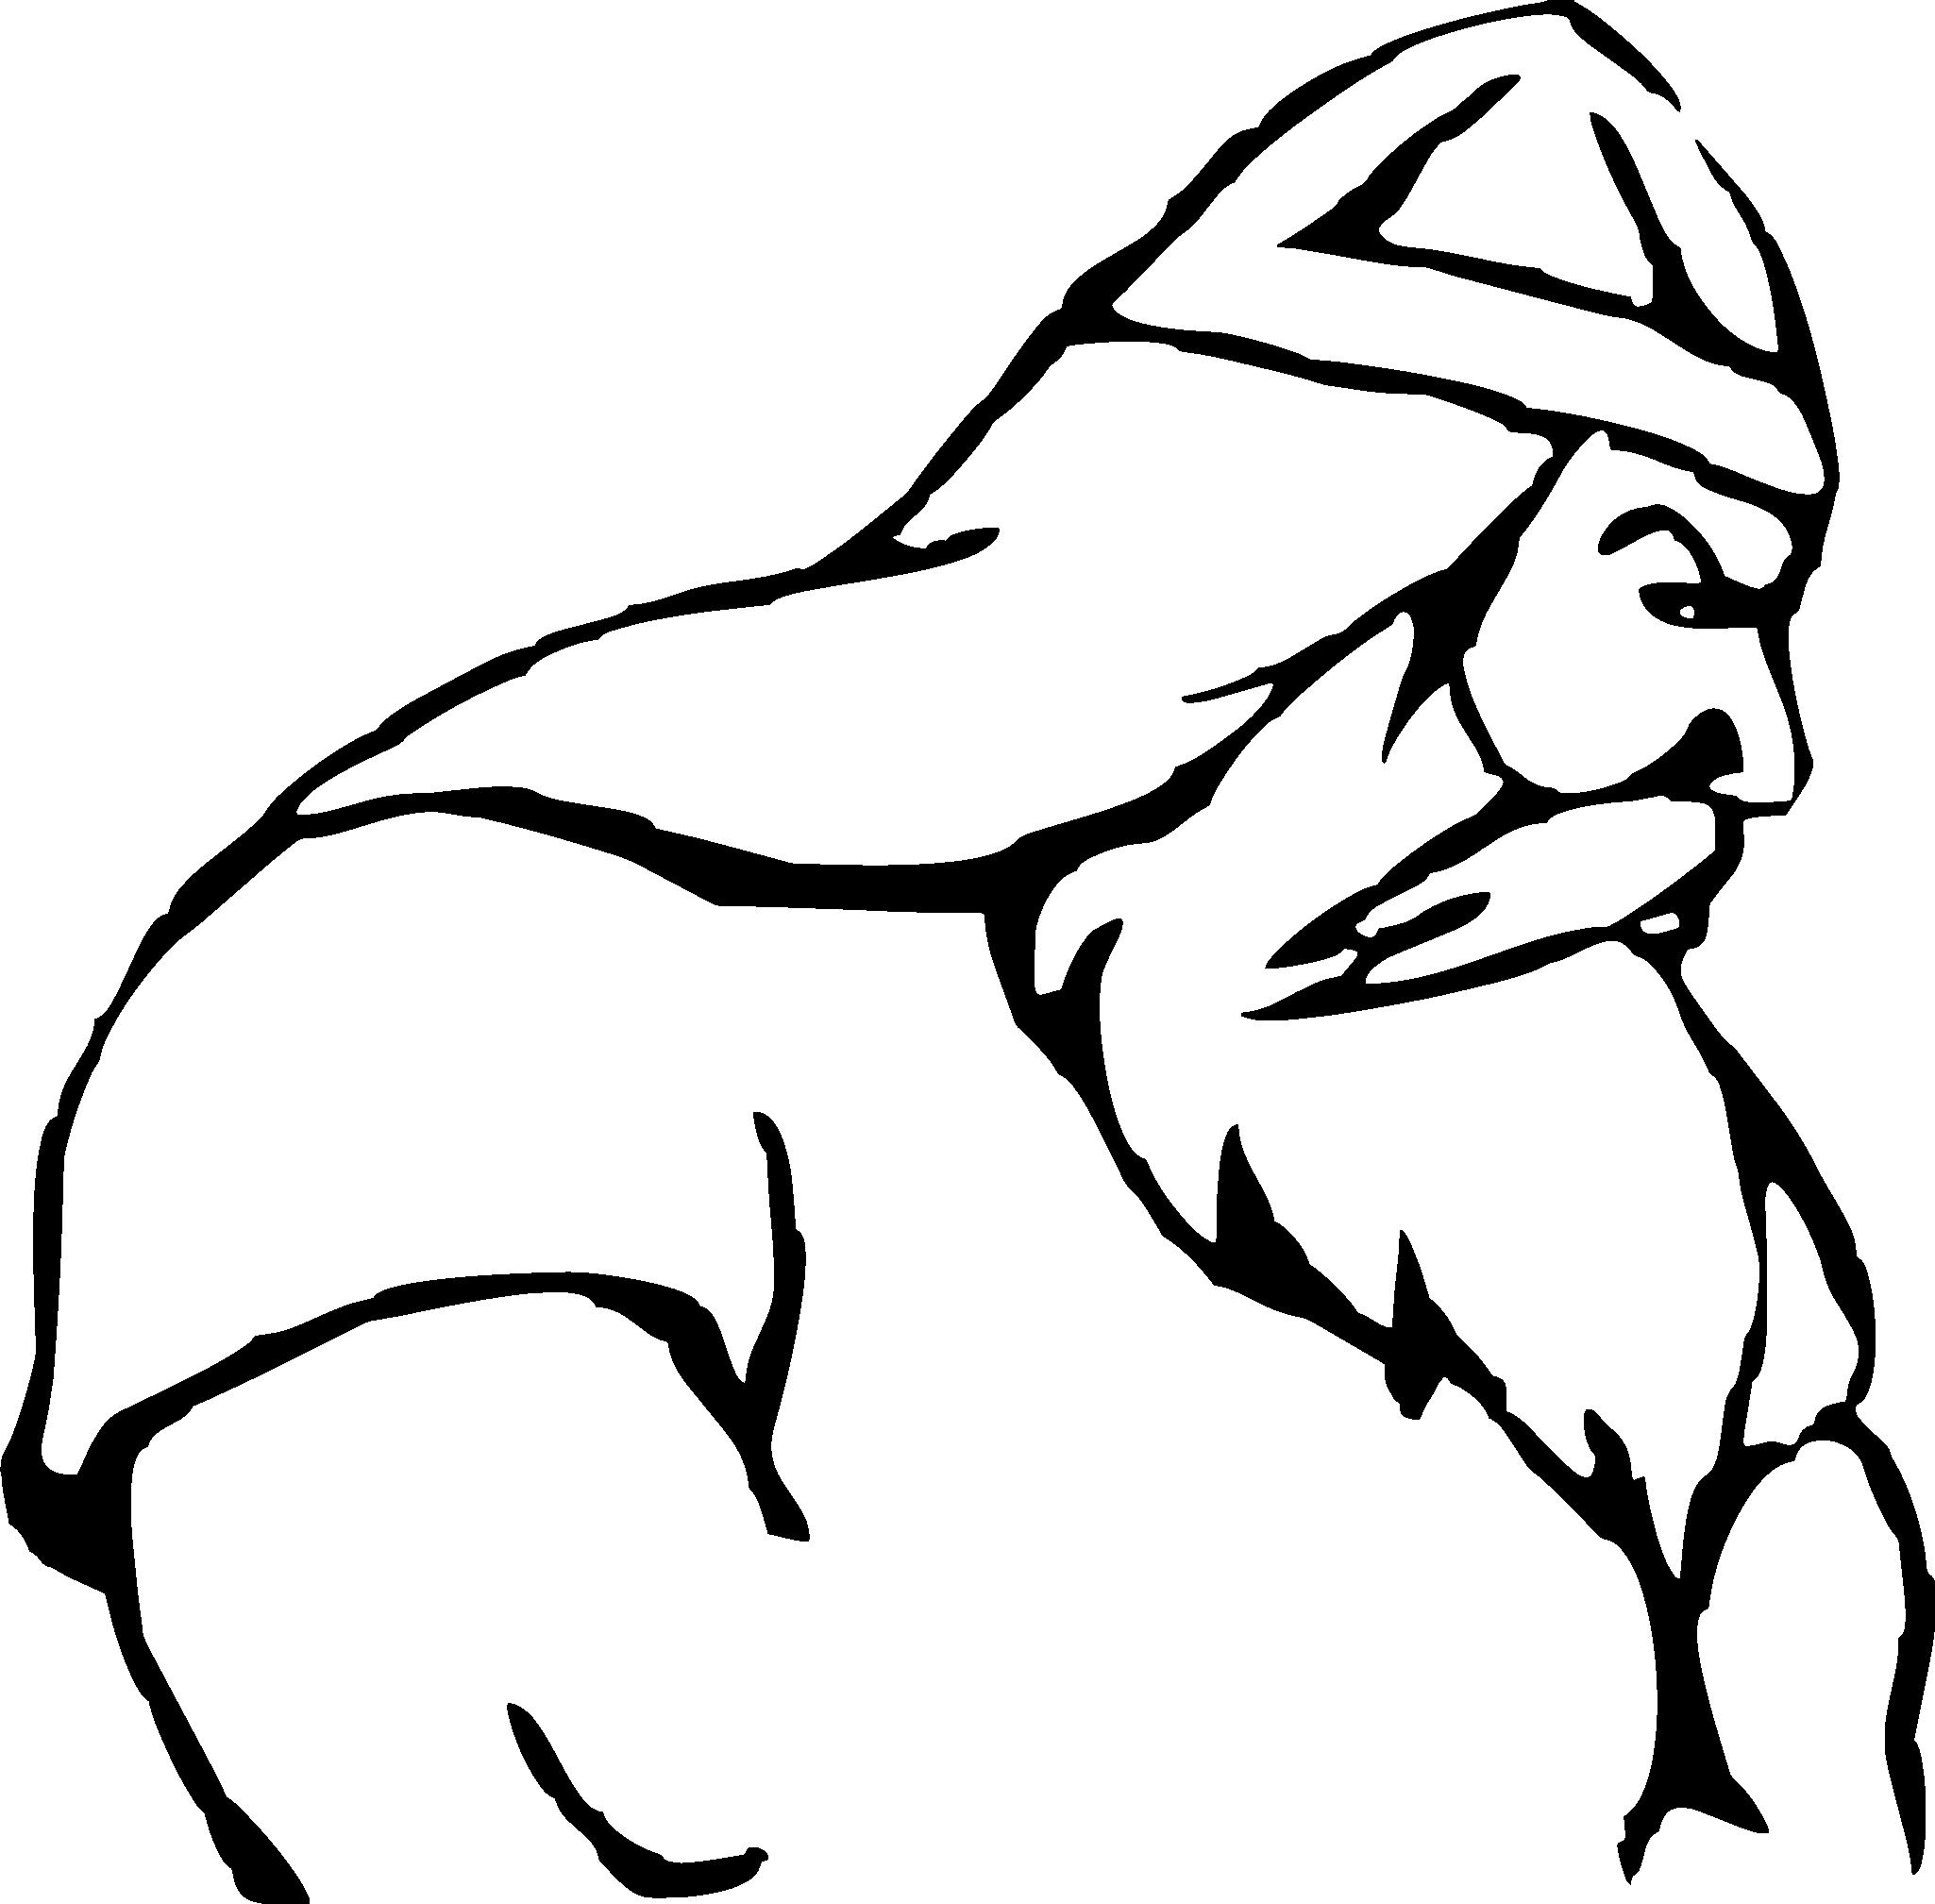 Bristol Trust logo